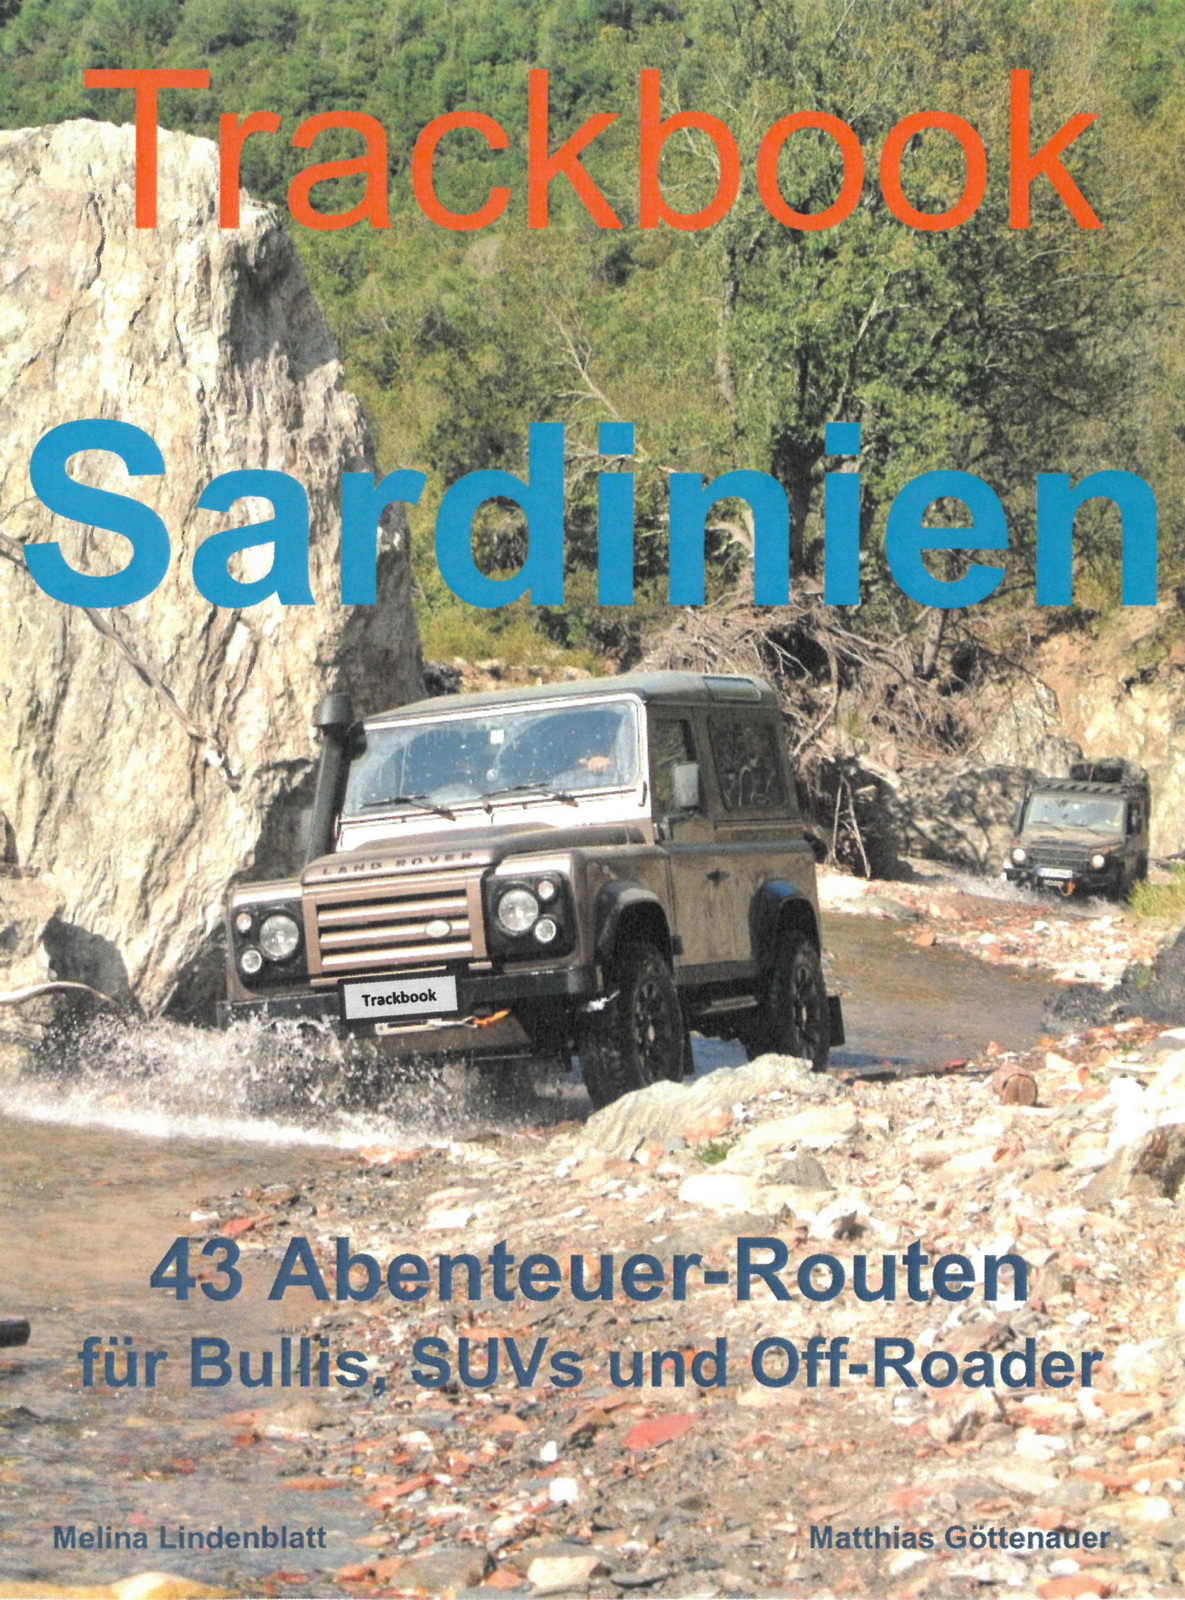 2018-04-14 Trackbook Sardinien 01